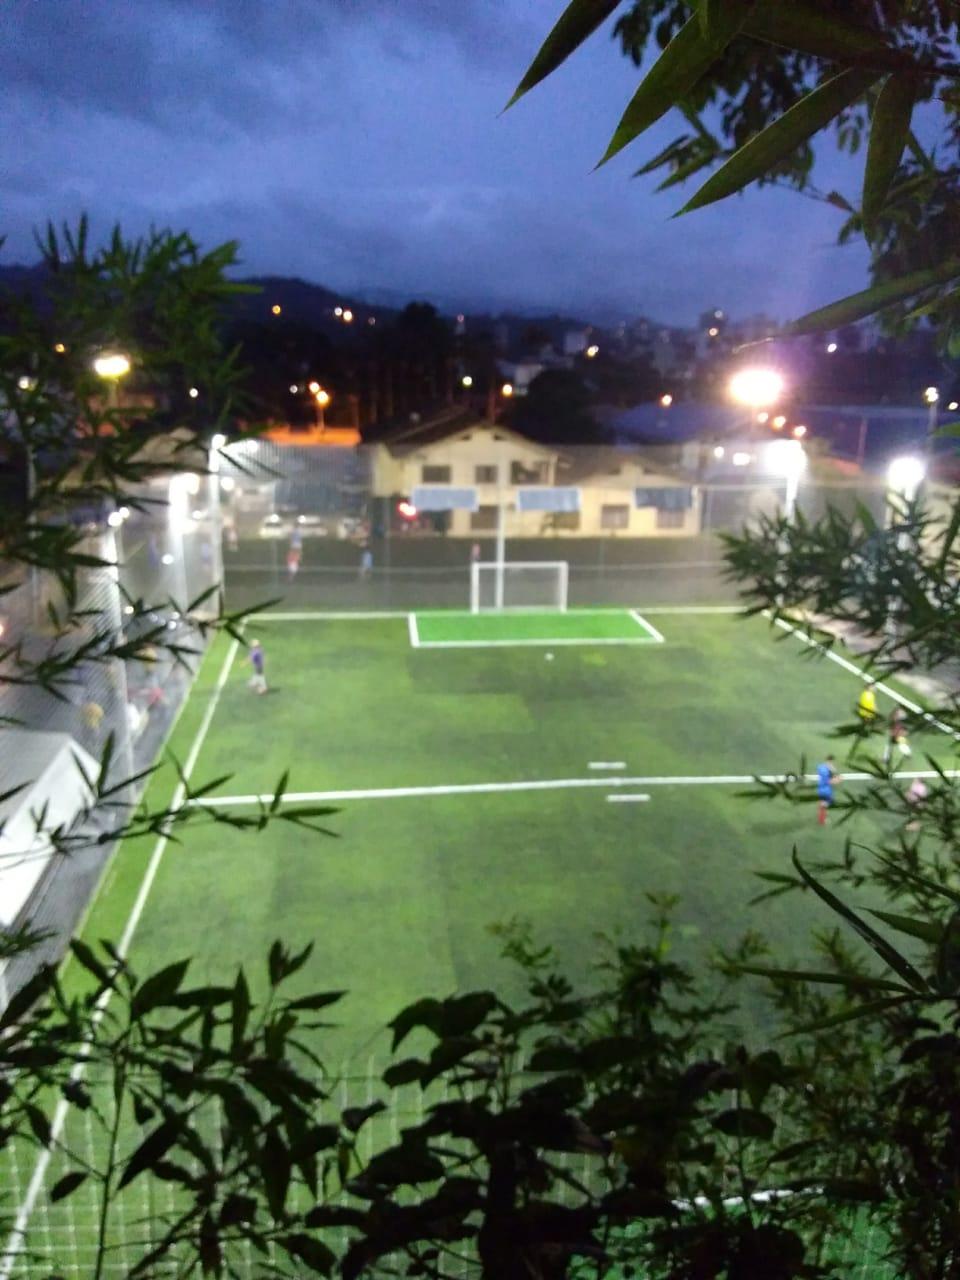 Campo sintético da Sociedade Ipiranga.